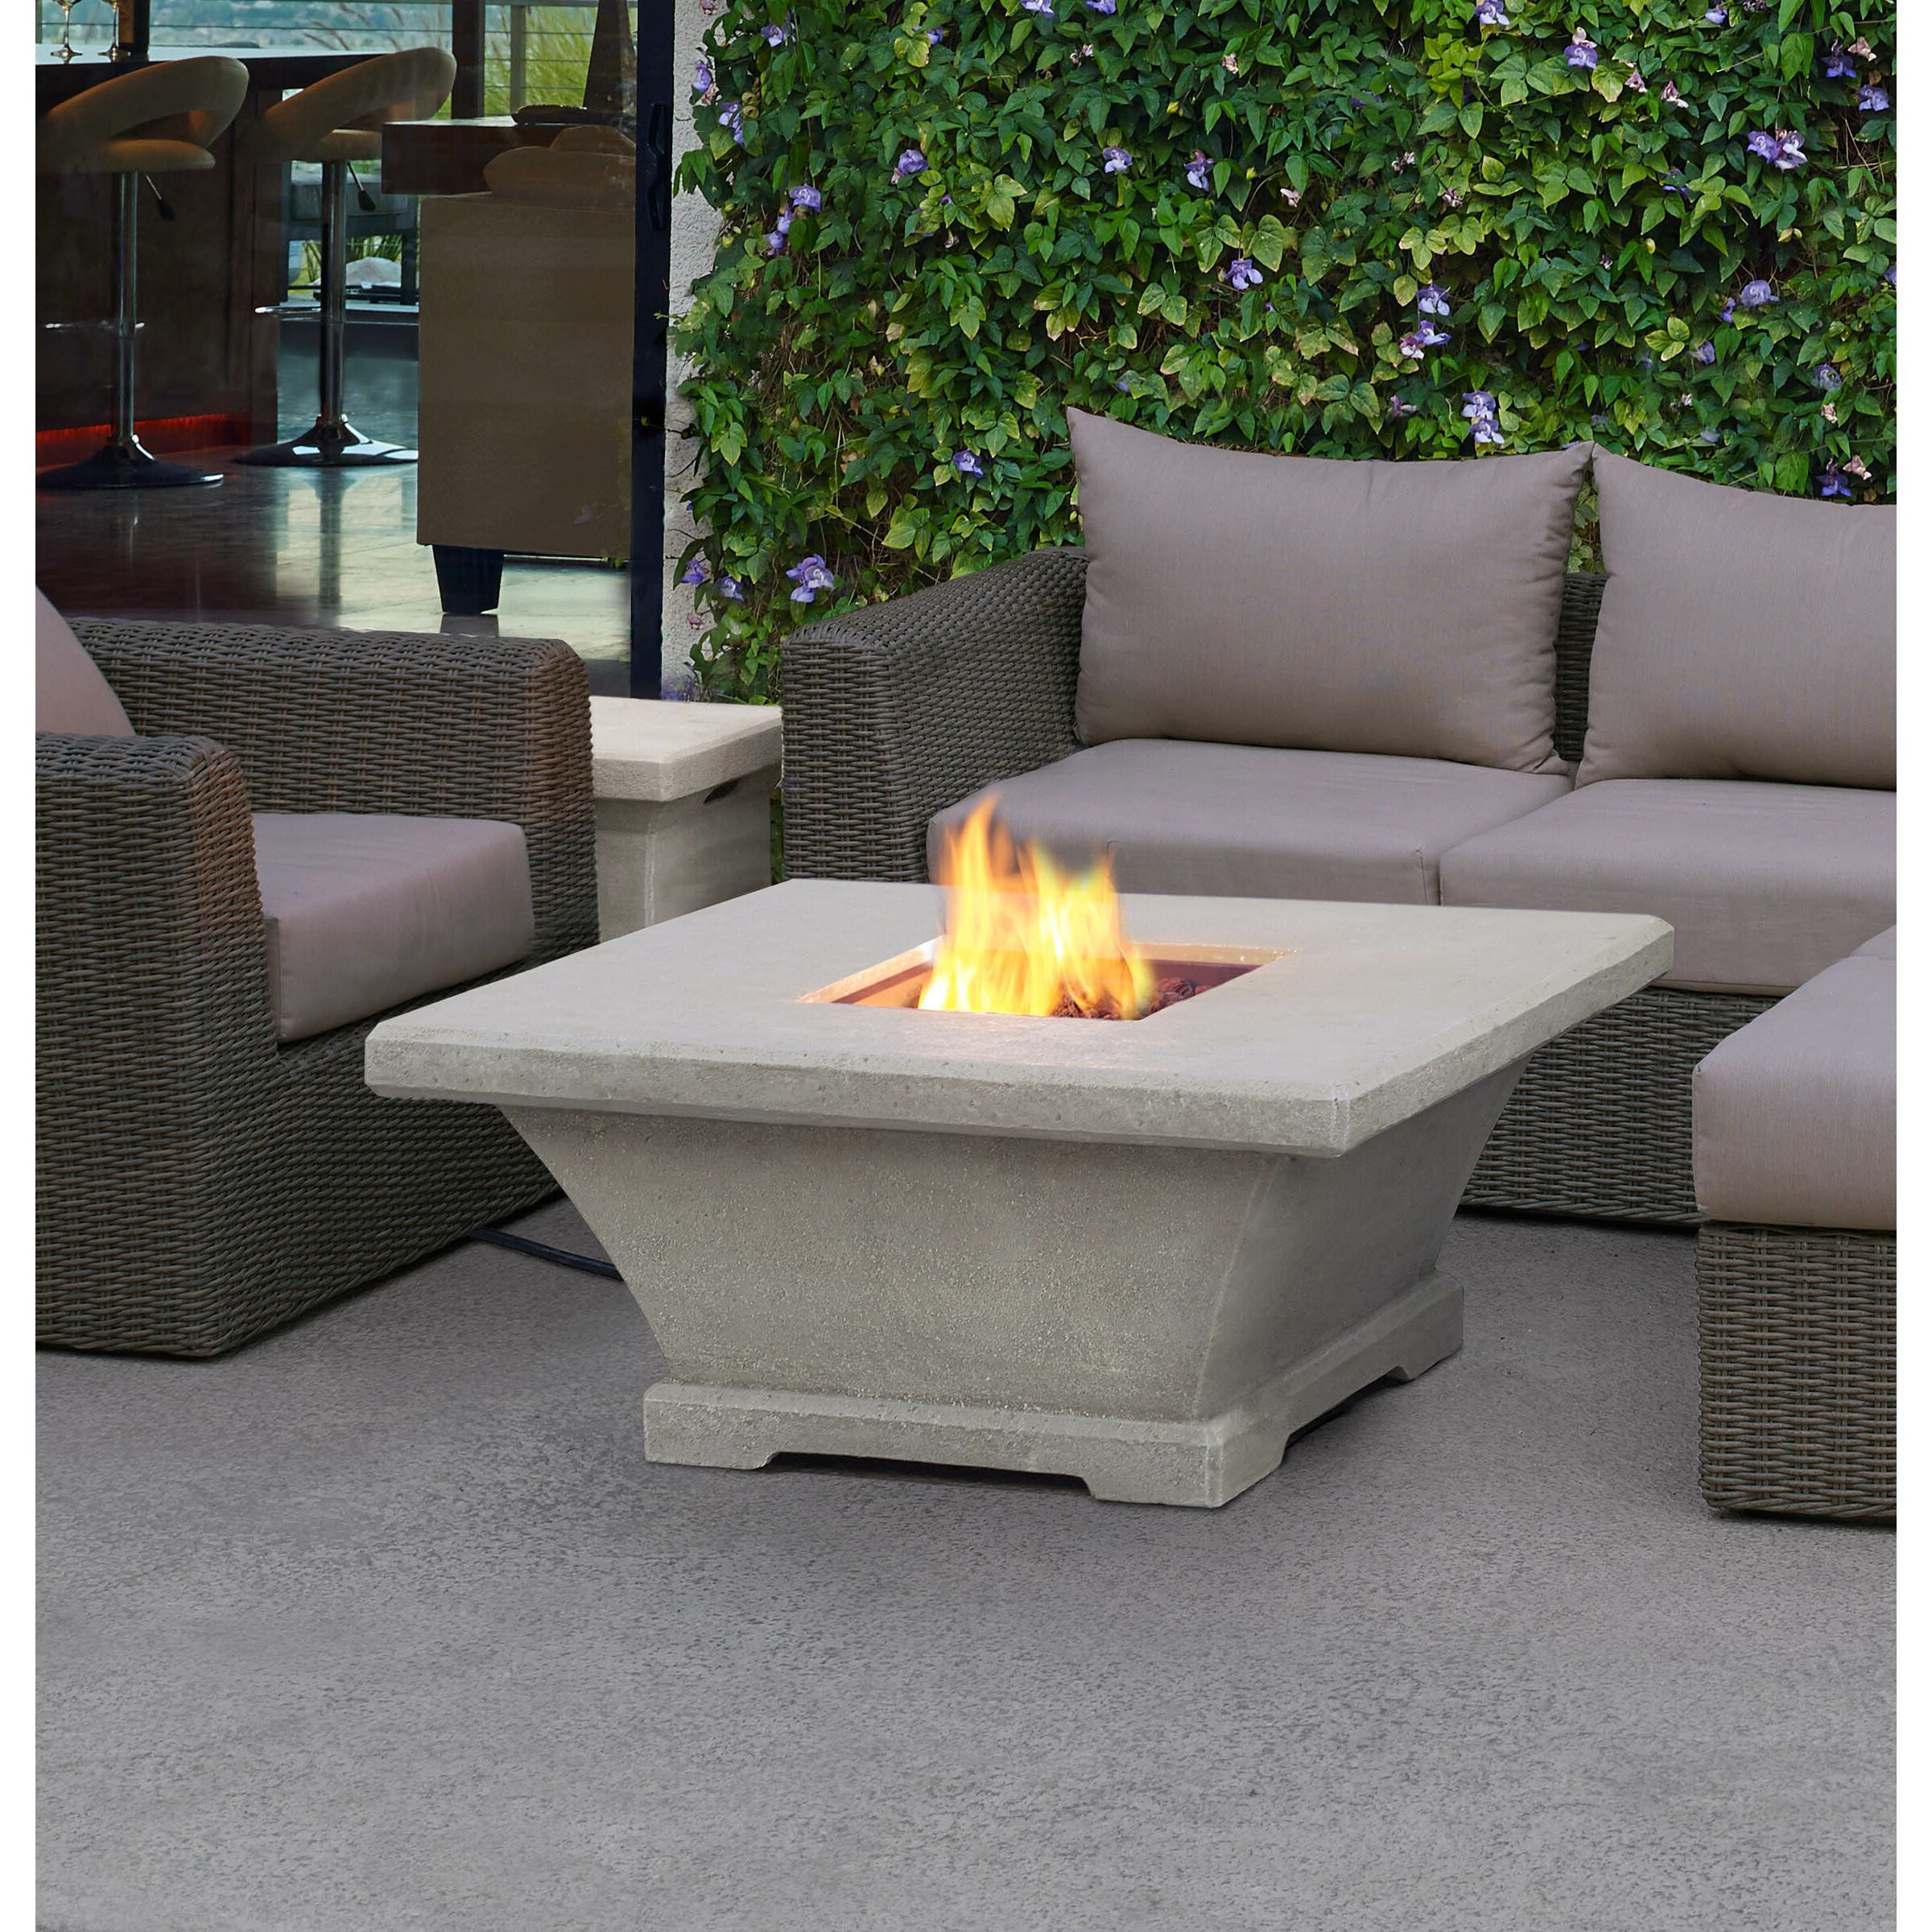 Propane Fire Pit Table  Real Flame Monaco Square Low Profile Propane Fire Pit